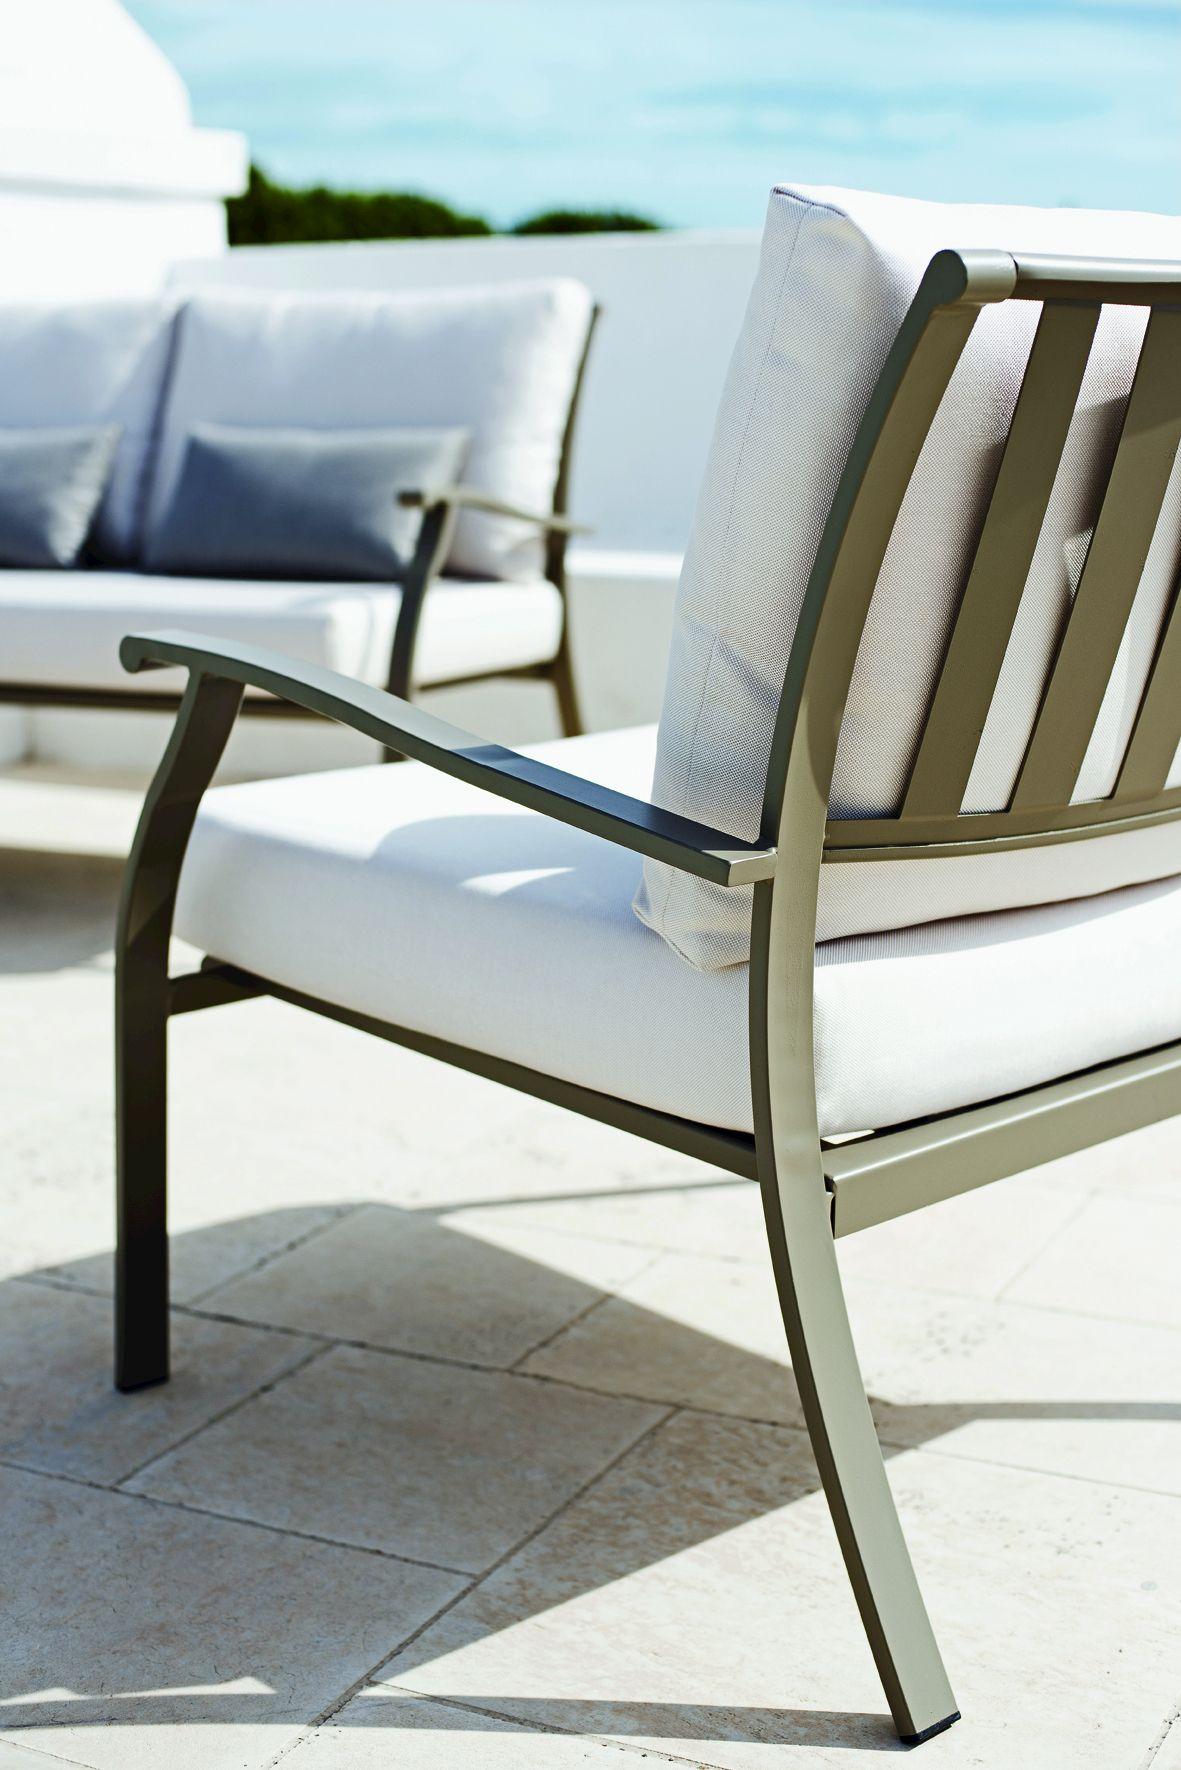 poltrona da giardino con braccioli elisir poltrona da giardino ethimo. Black Bedroom Furniture Sets. Home Design Ideas